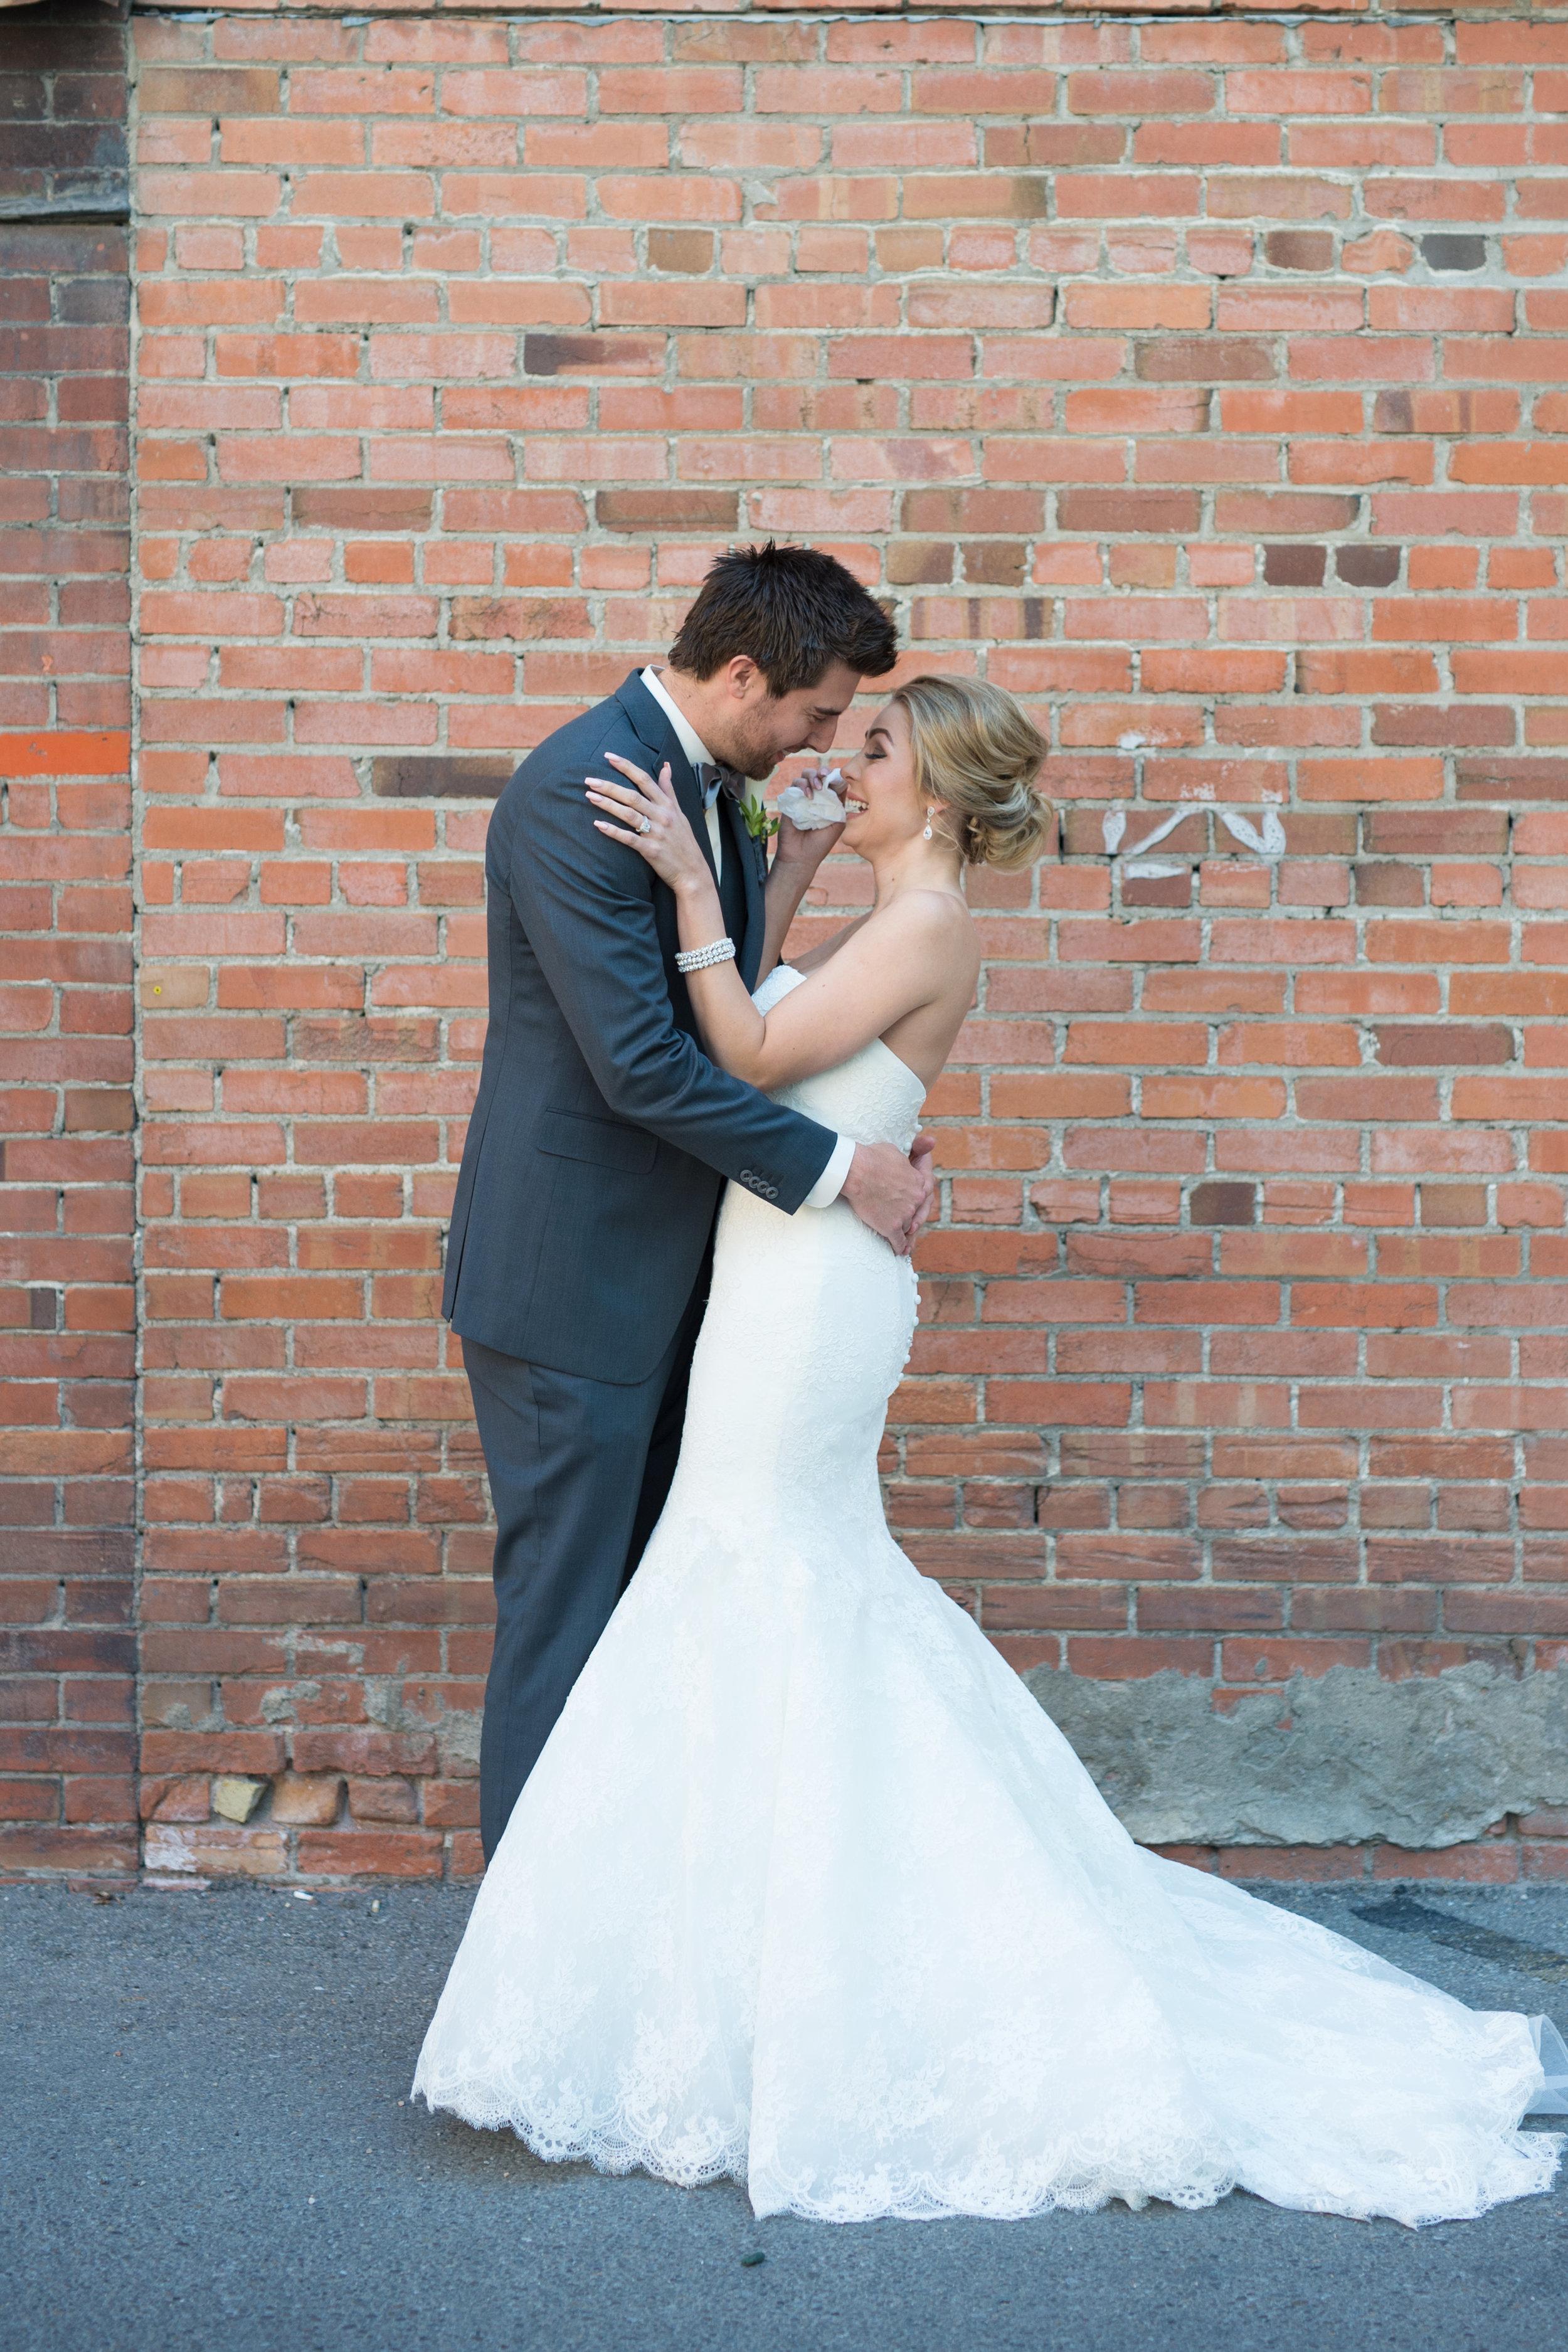 Calgary_Wedding_Photographer_Sanja_Scott_2016_HR 0213.jpg